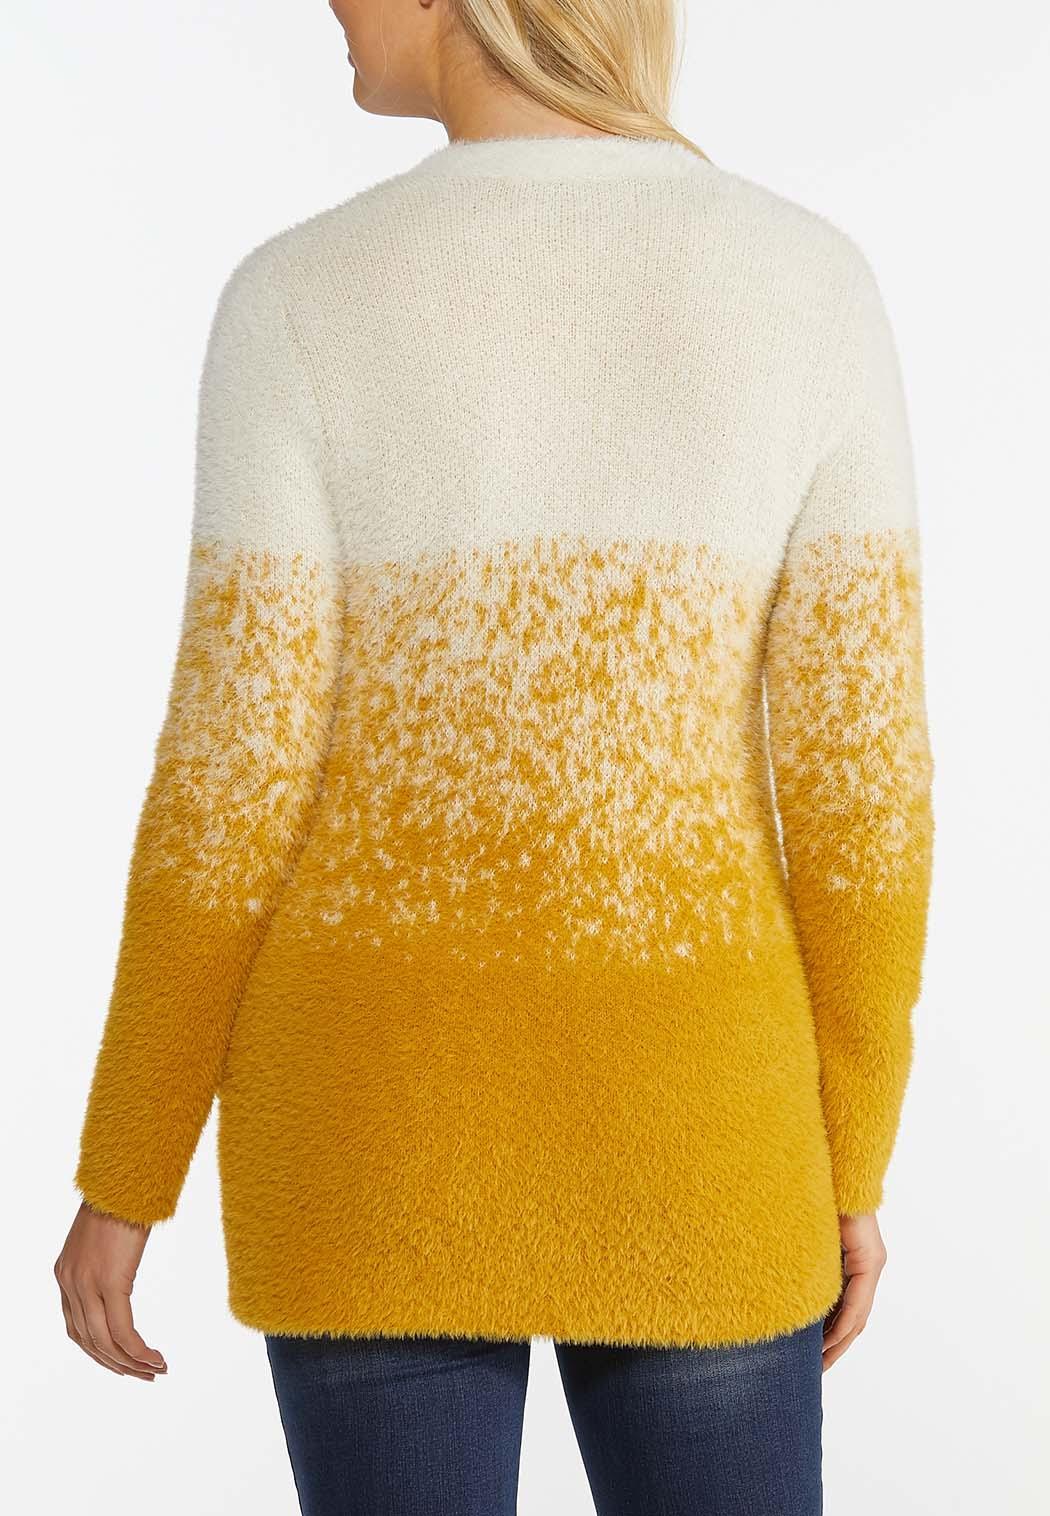 Honey Ombre Sweater (Item #44385359)